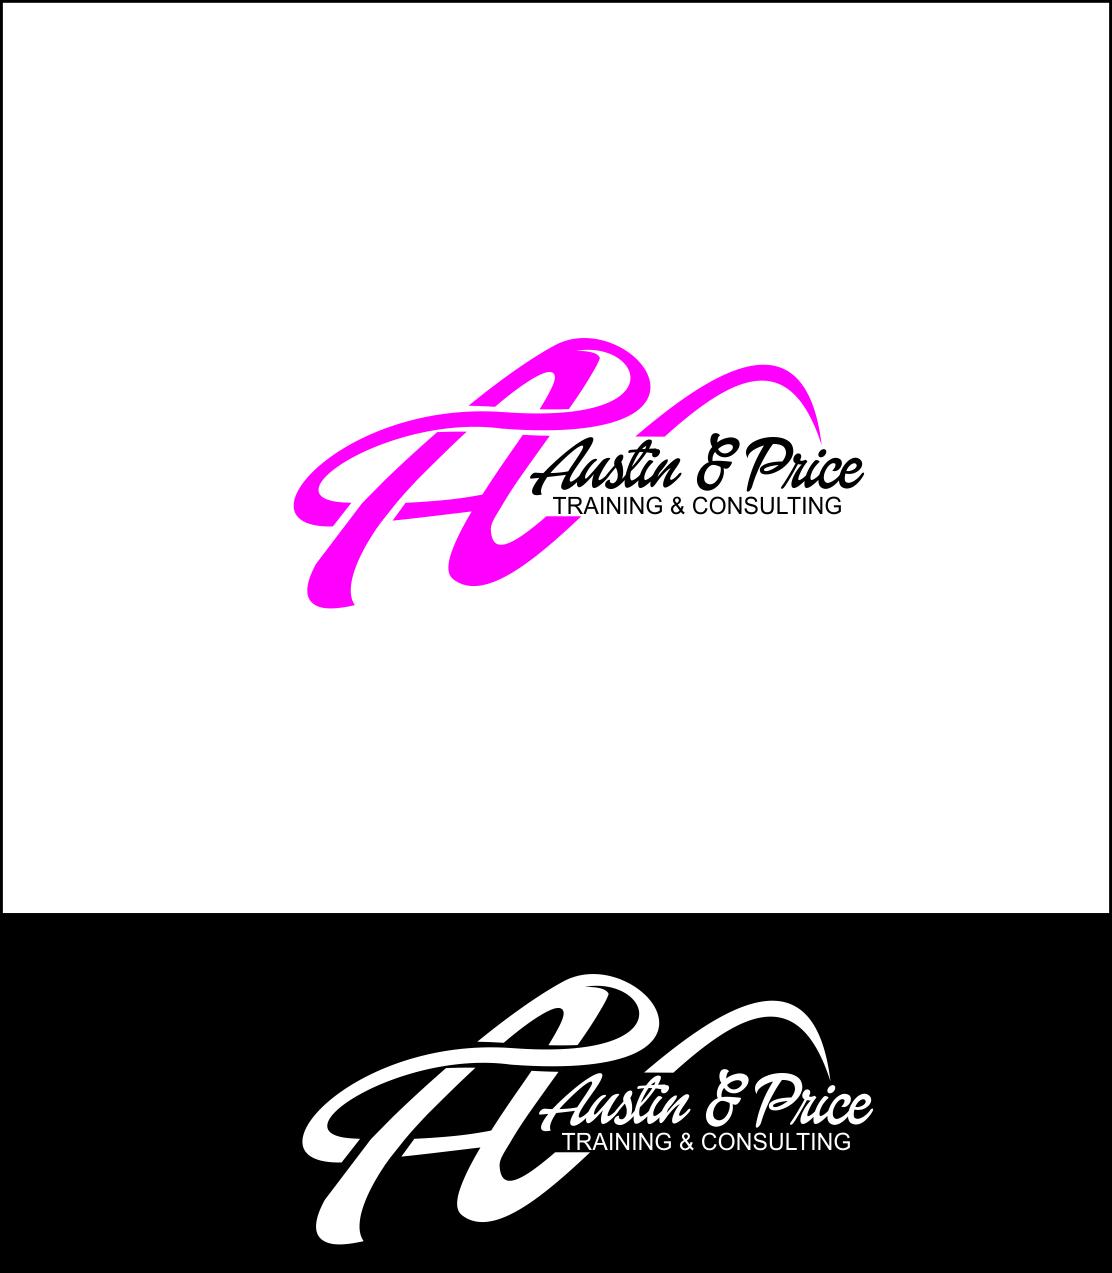 Logo Design by Agus Martoyo - Entry No. 165 in the Logo Design Contest Artistic Logo Design for Austin Price Advisory.